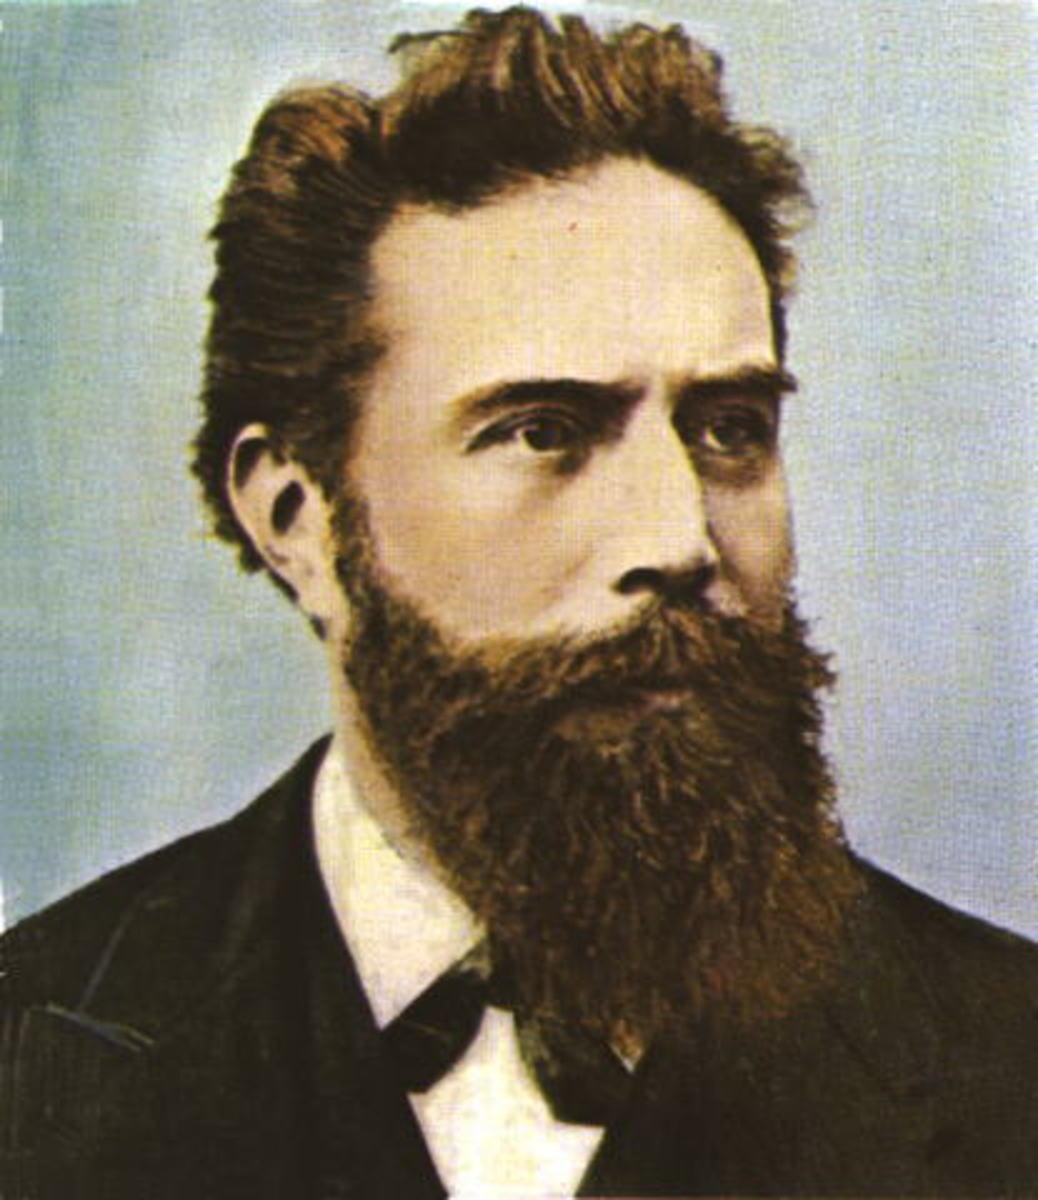 Wilhelm Röntgen: The Father of Diagnostic Radiology